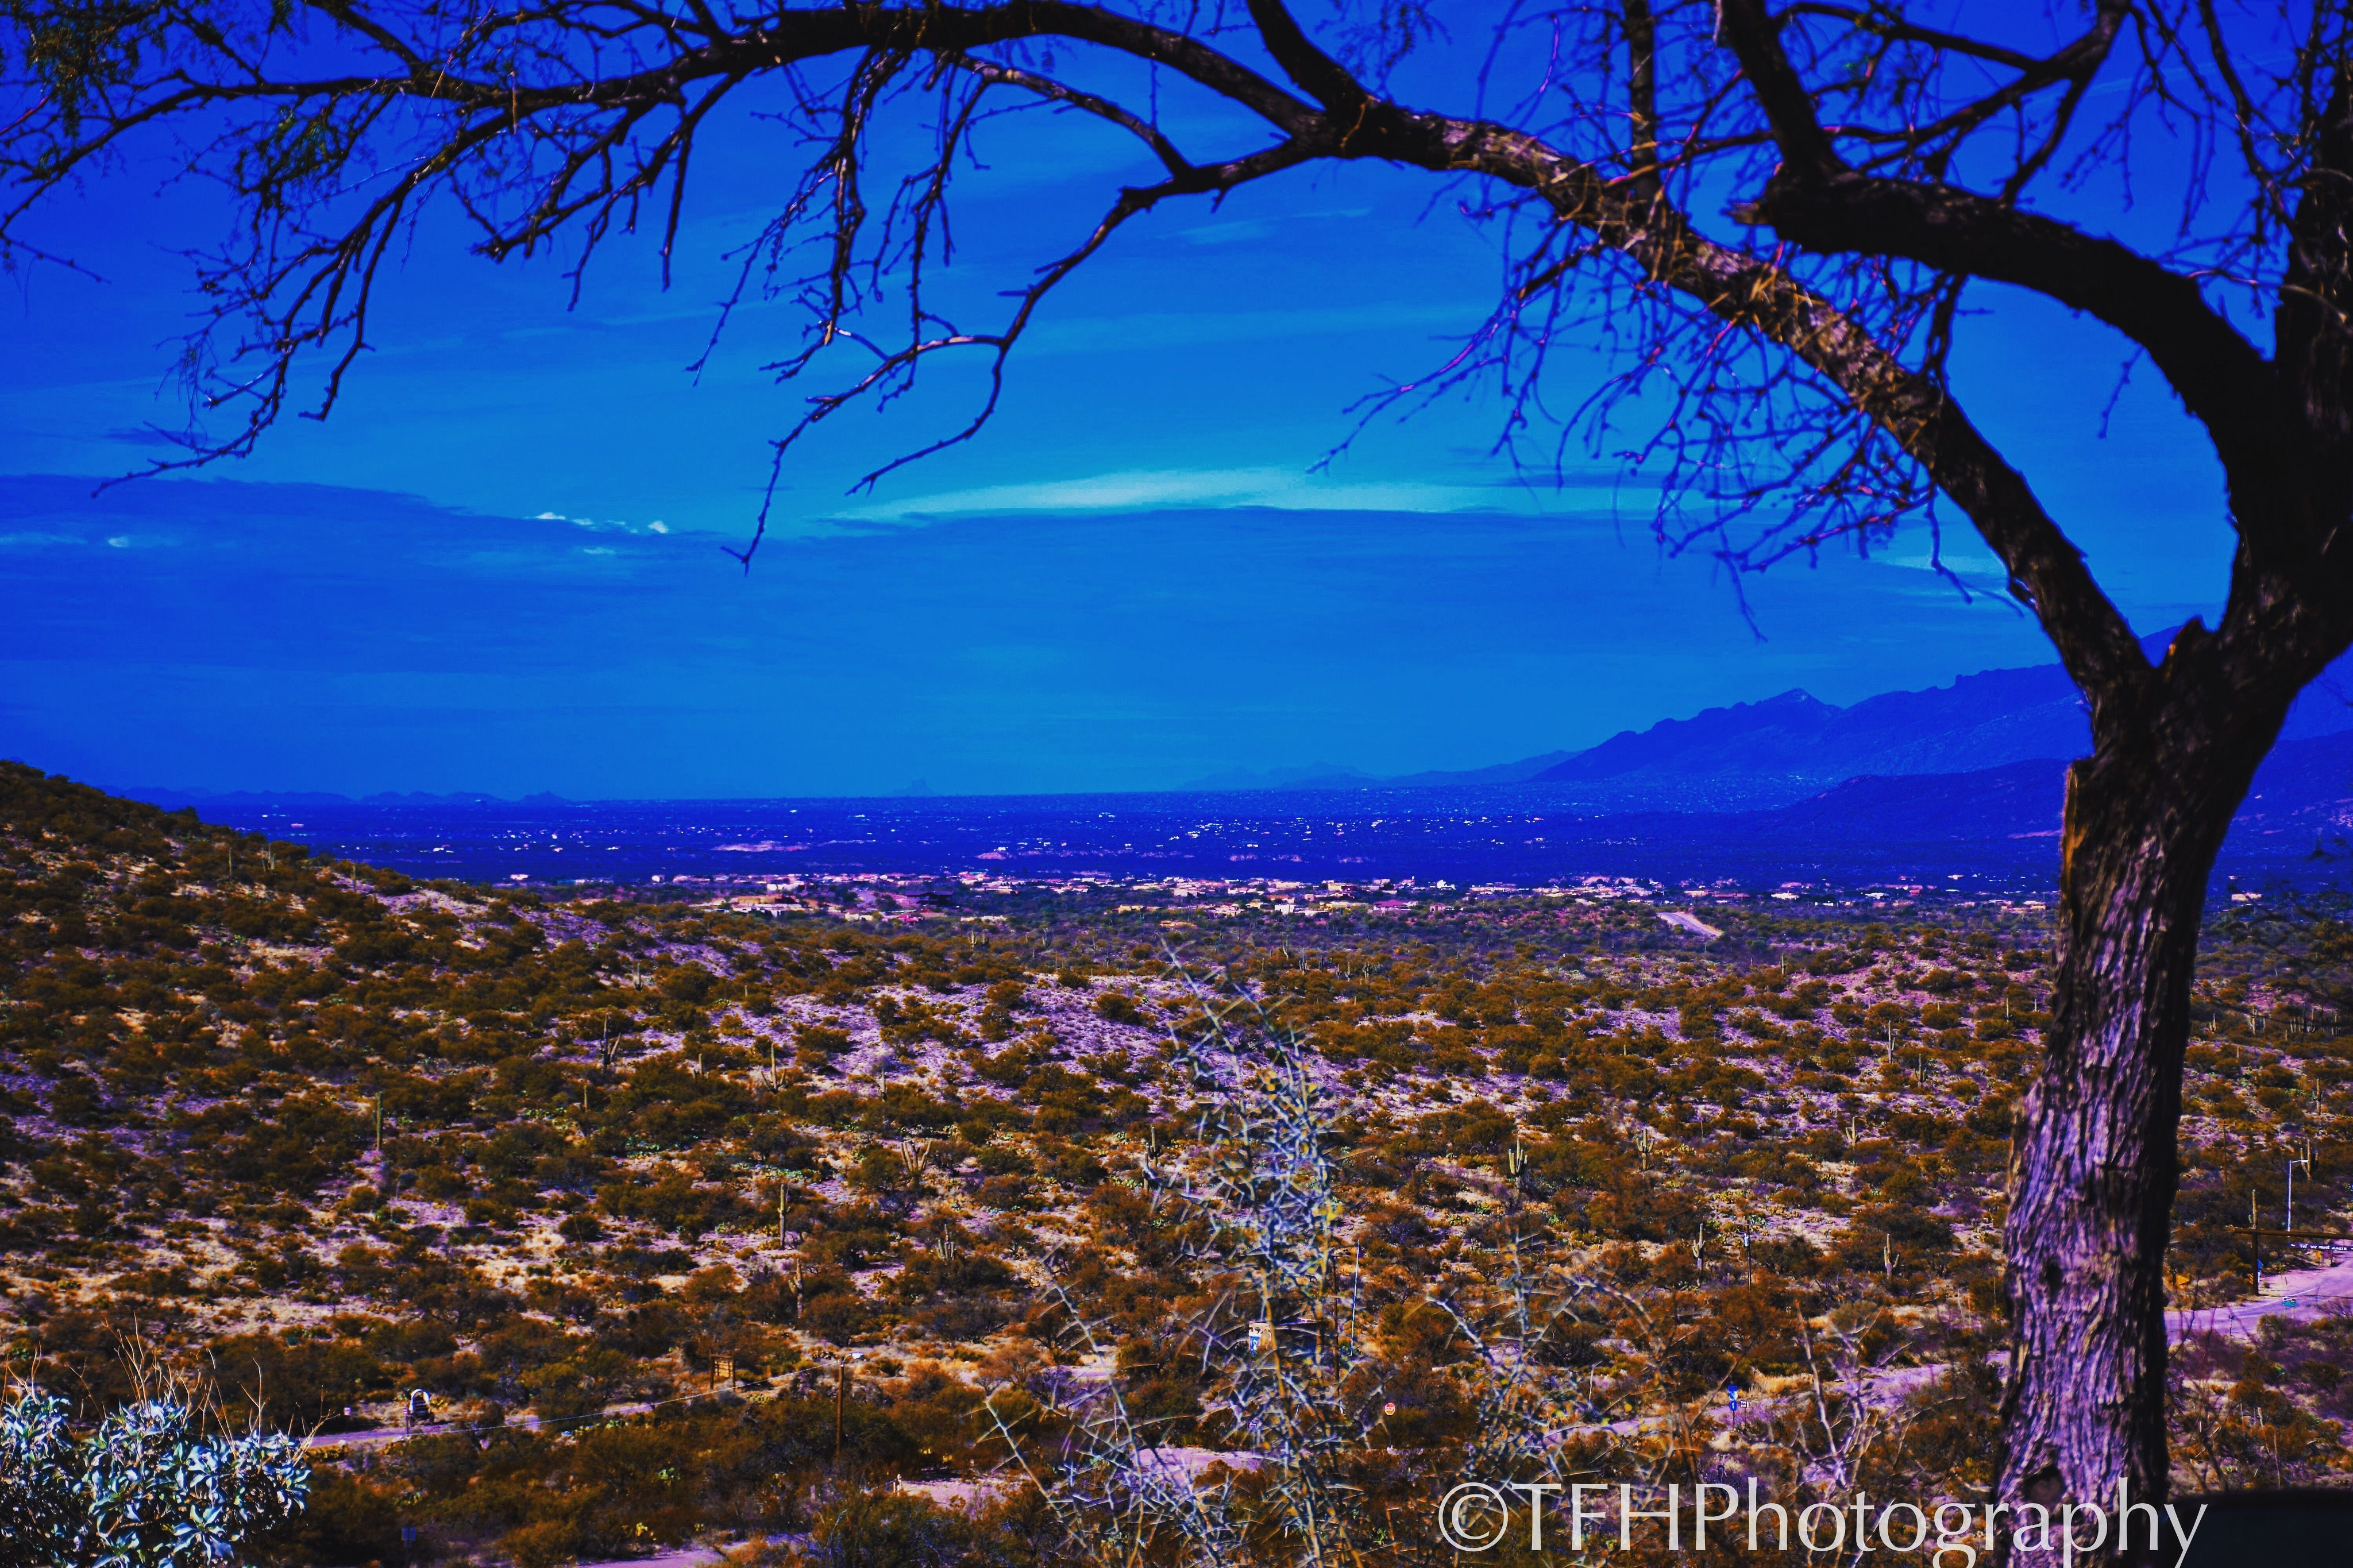 Surreal Tucson Landscape Scene